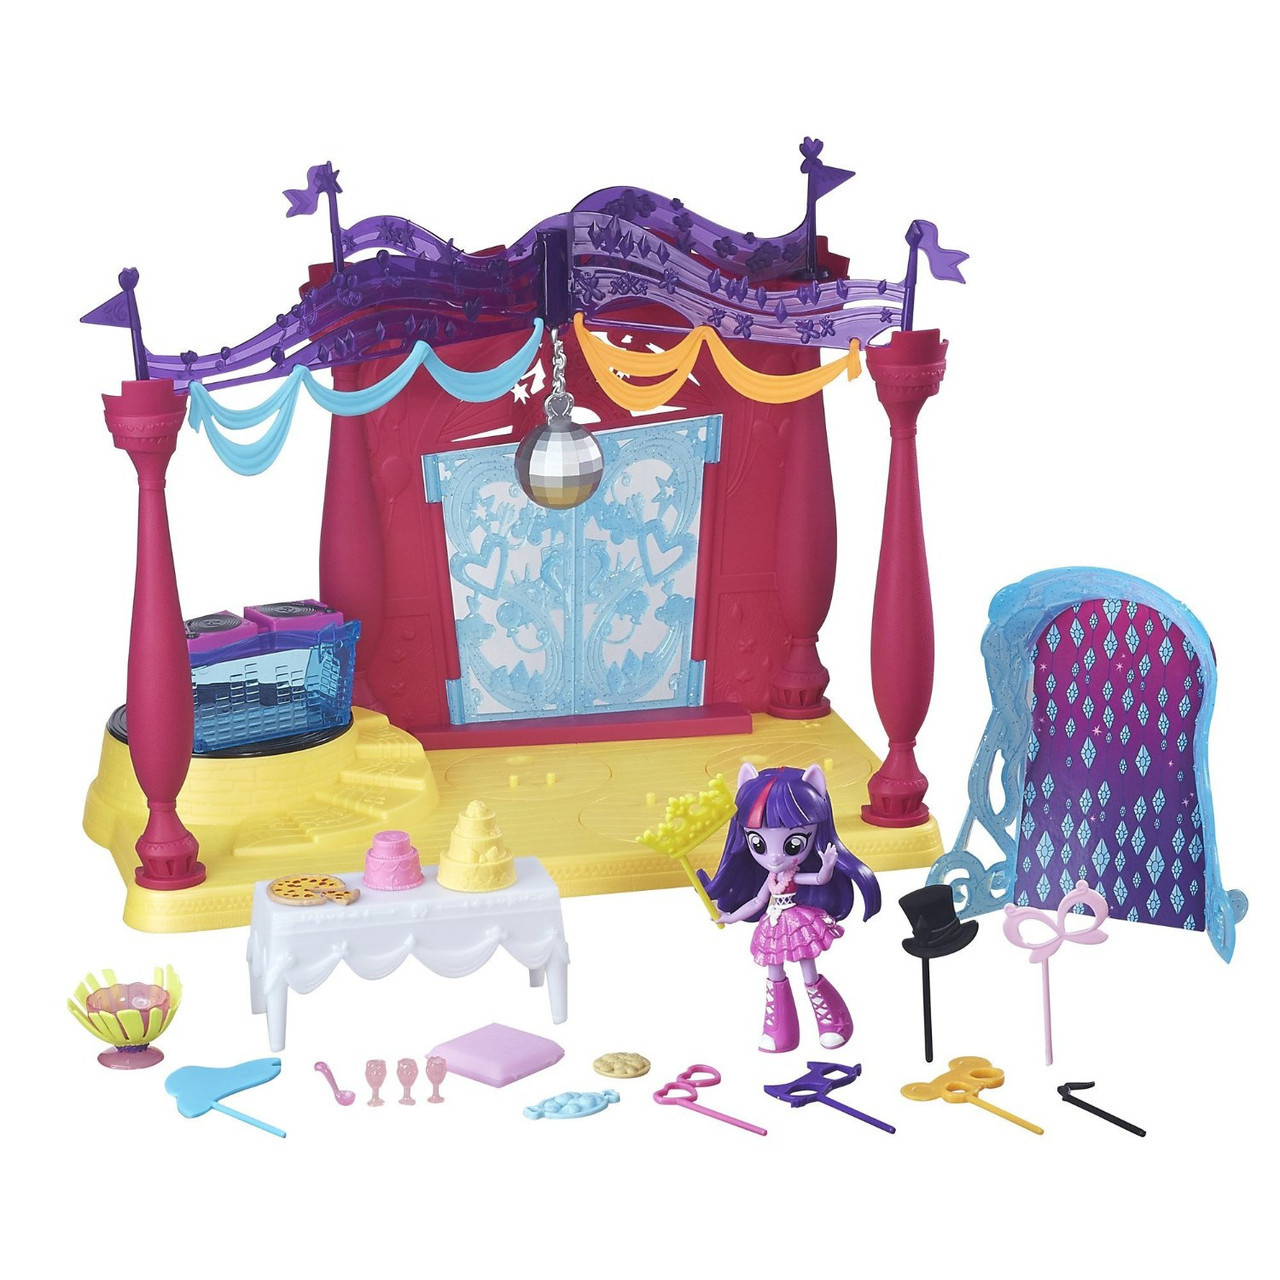 Игровой набор пони Дискотека Твайлайт Спаркл  серия Мy Little Pony Equestria girls